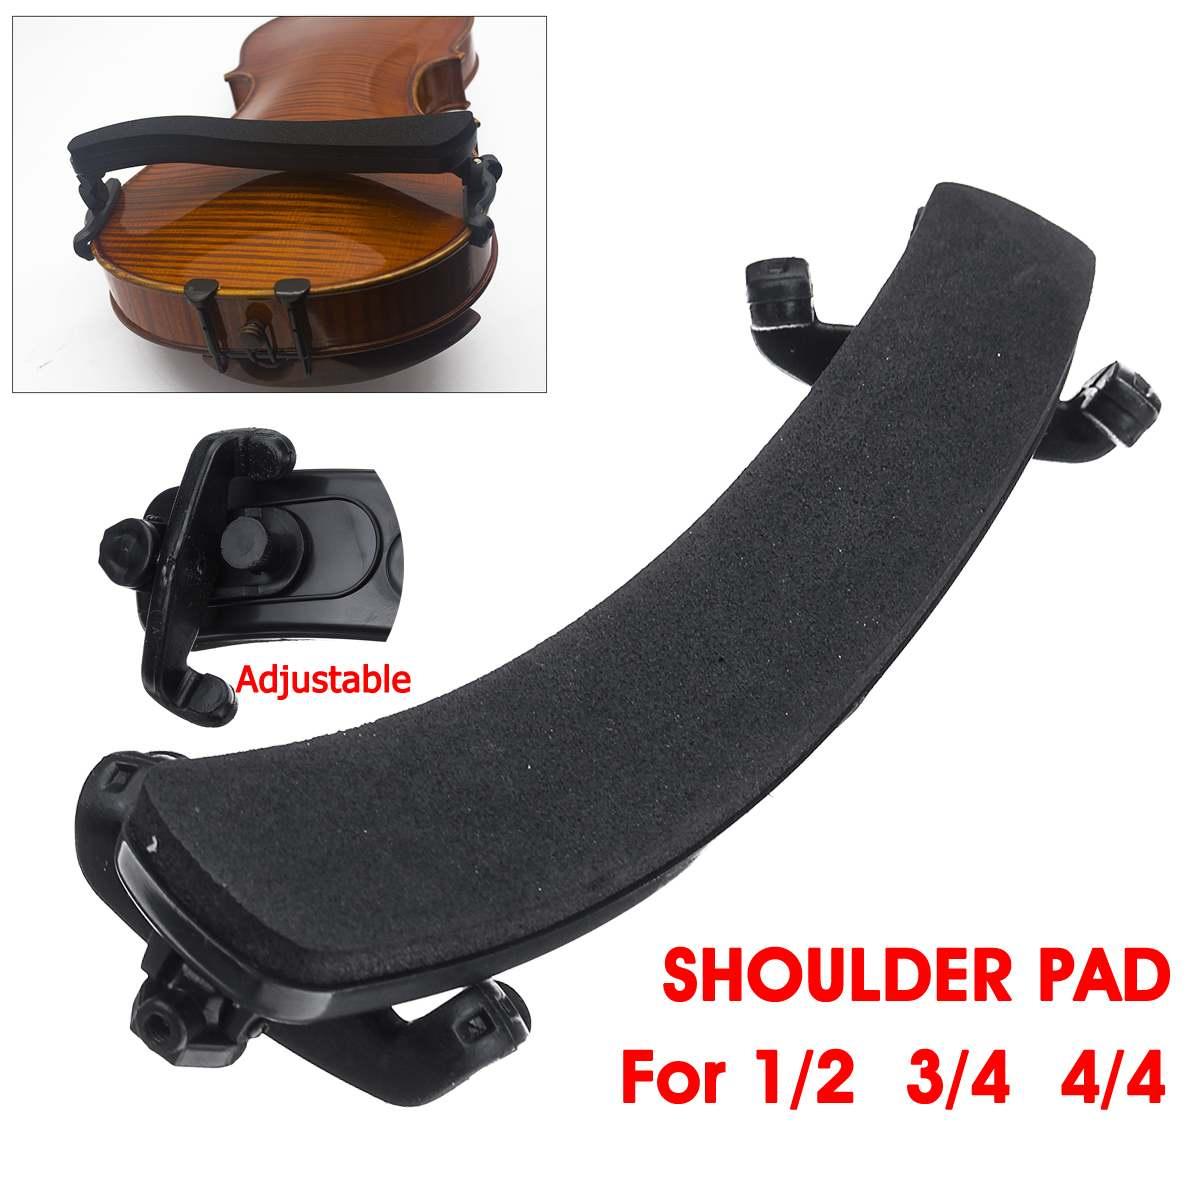 Adjustable Violin Soft Sponge Shoulder Chin Rest Support Cover Protector Pad For 1/2 3/4 4/4 Bridge Type Violin Fiddle Accessori